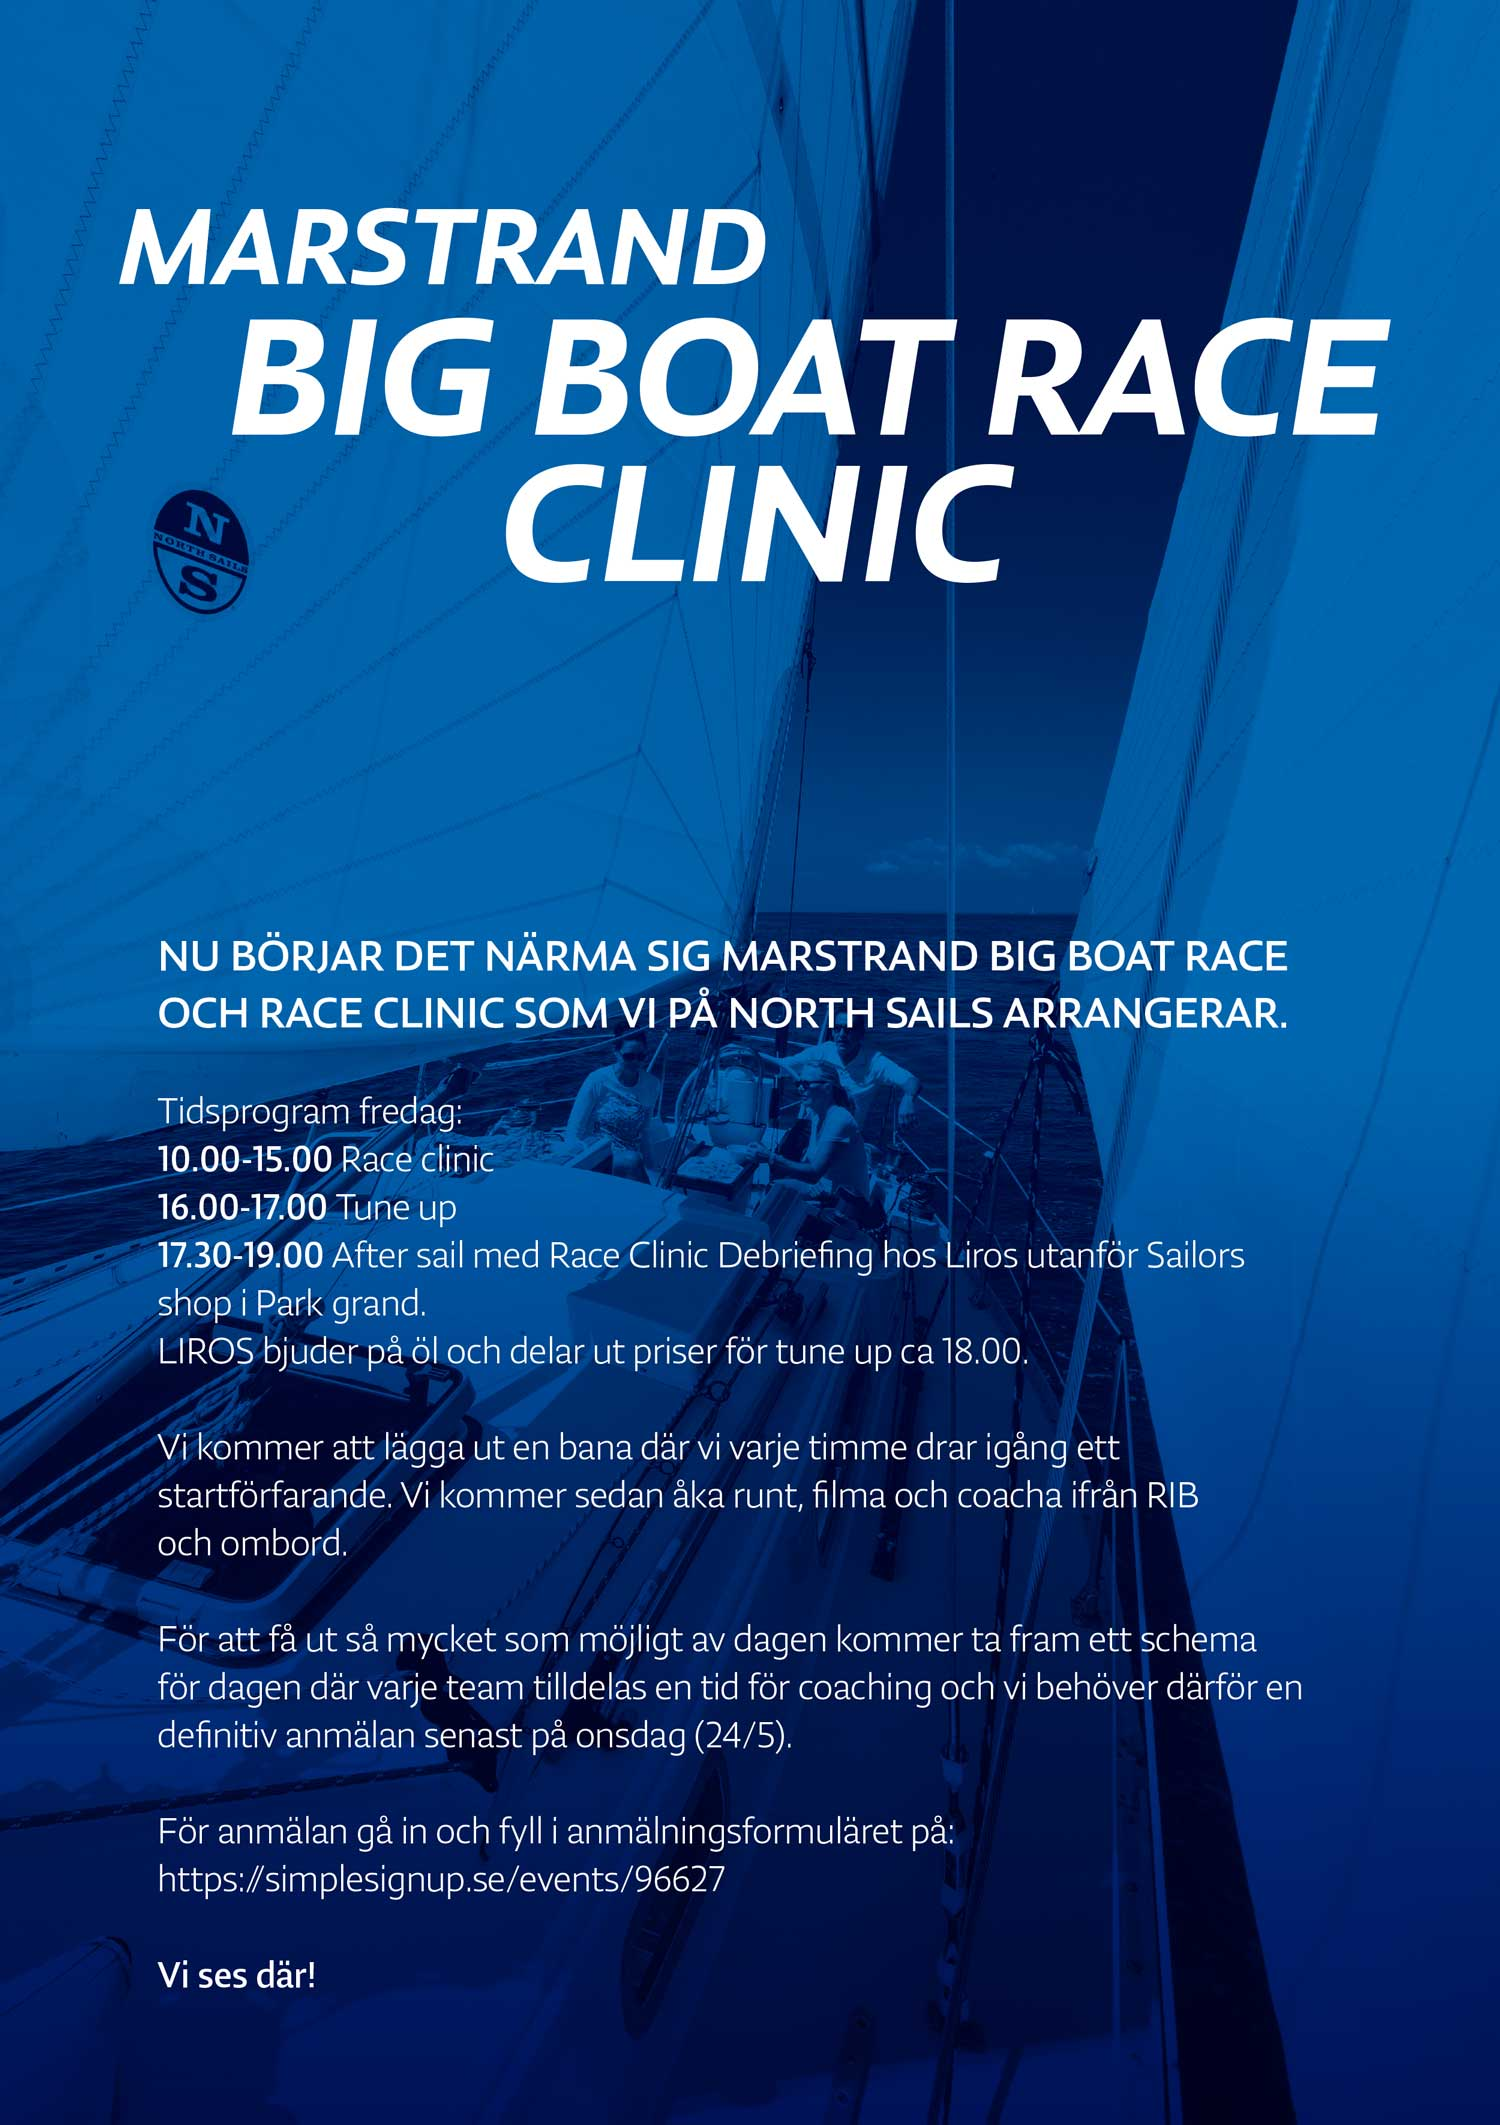 North Sails MBBR Race Clinic